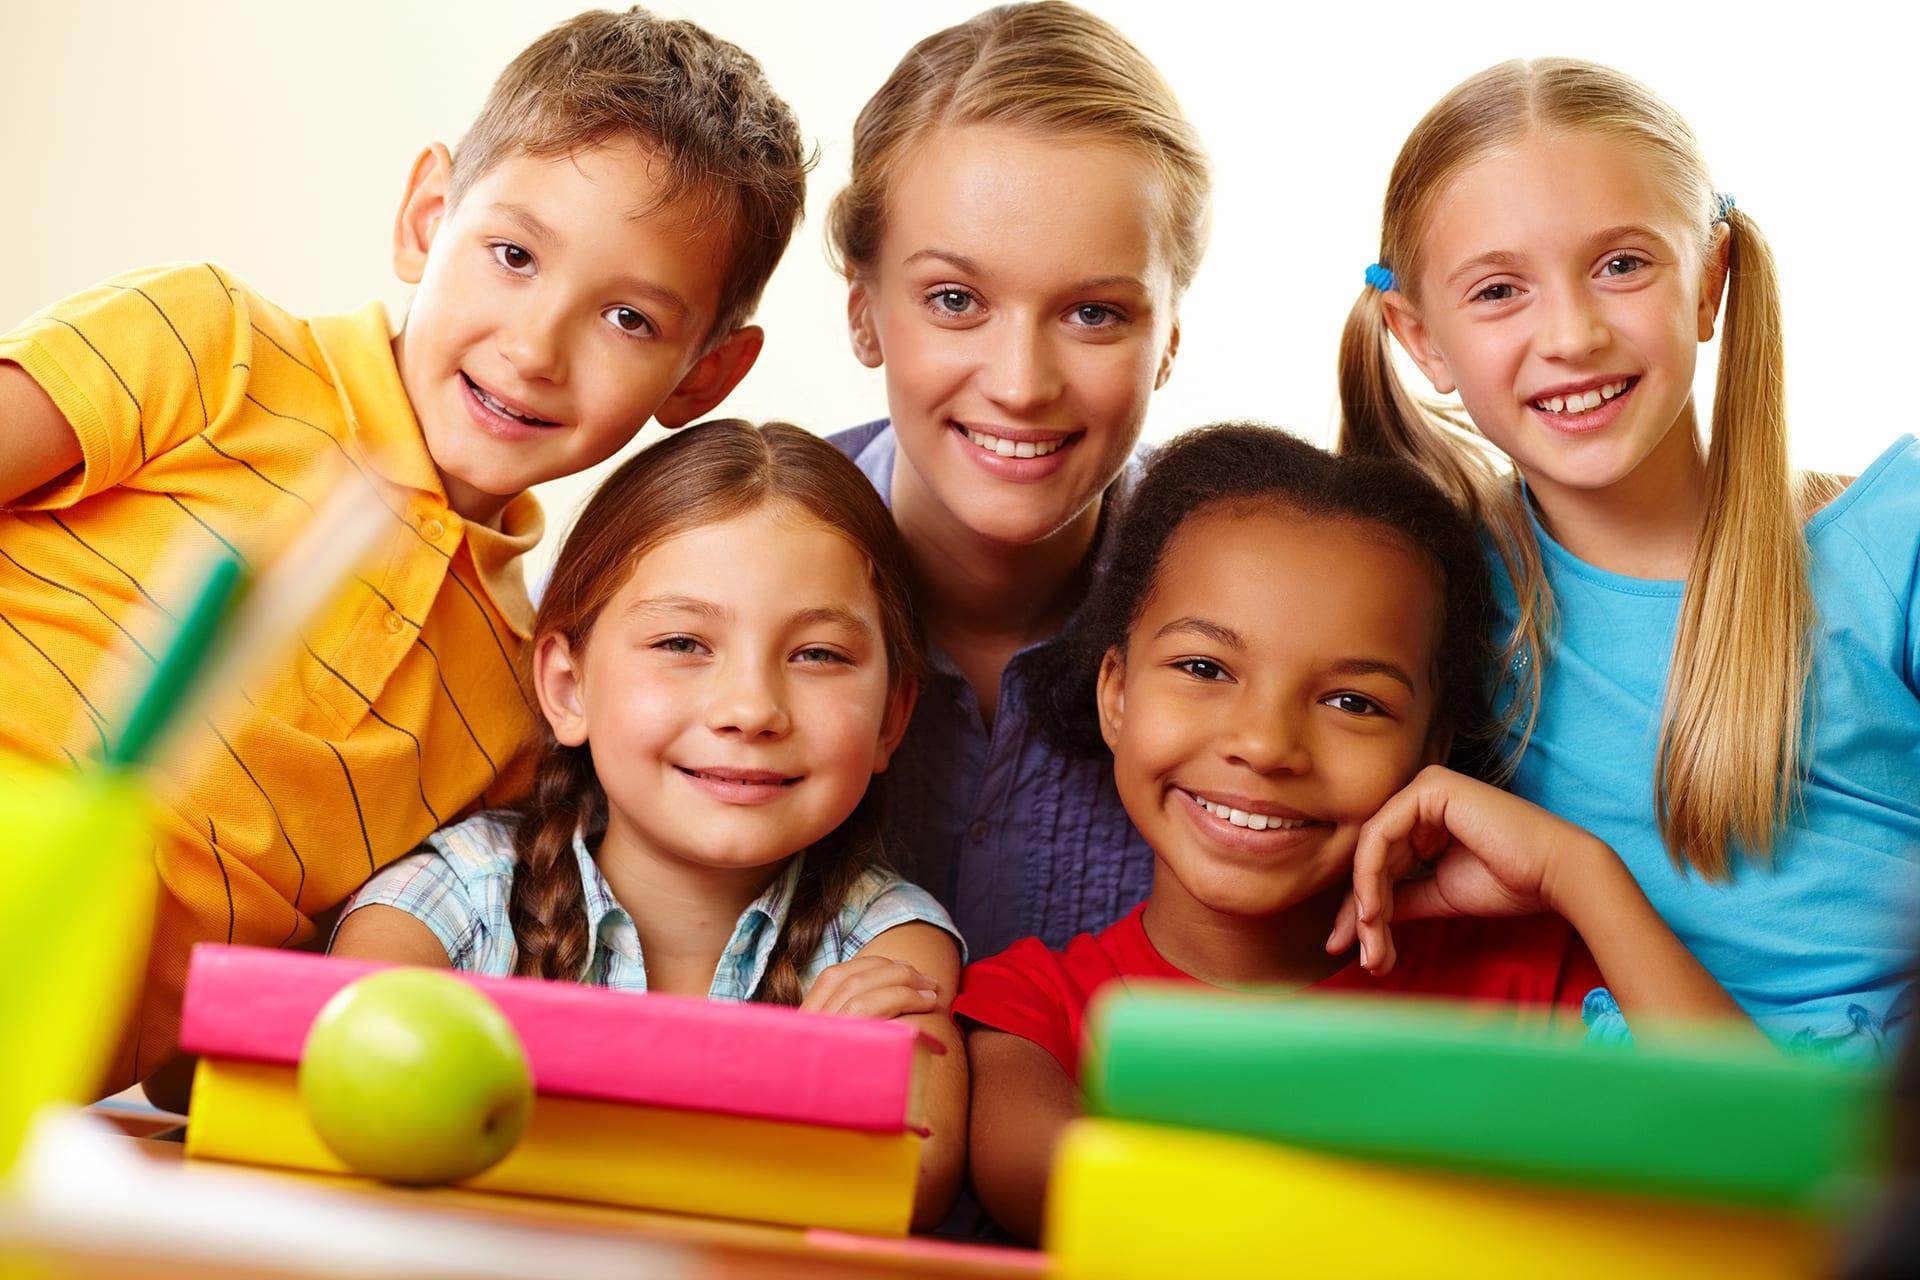 Portrait of smart schoolchildren and their teacher looking at camera in classroom